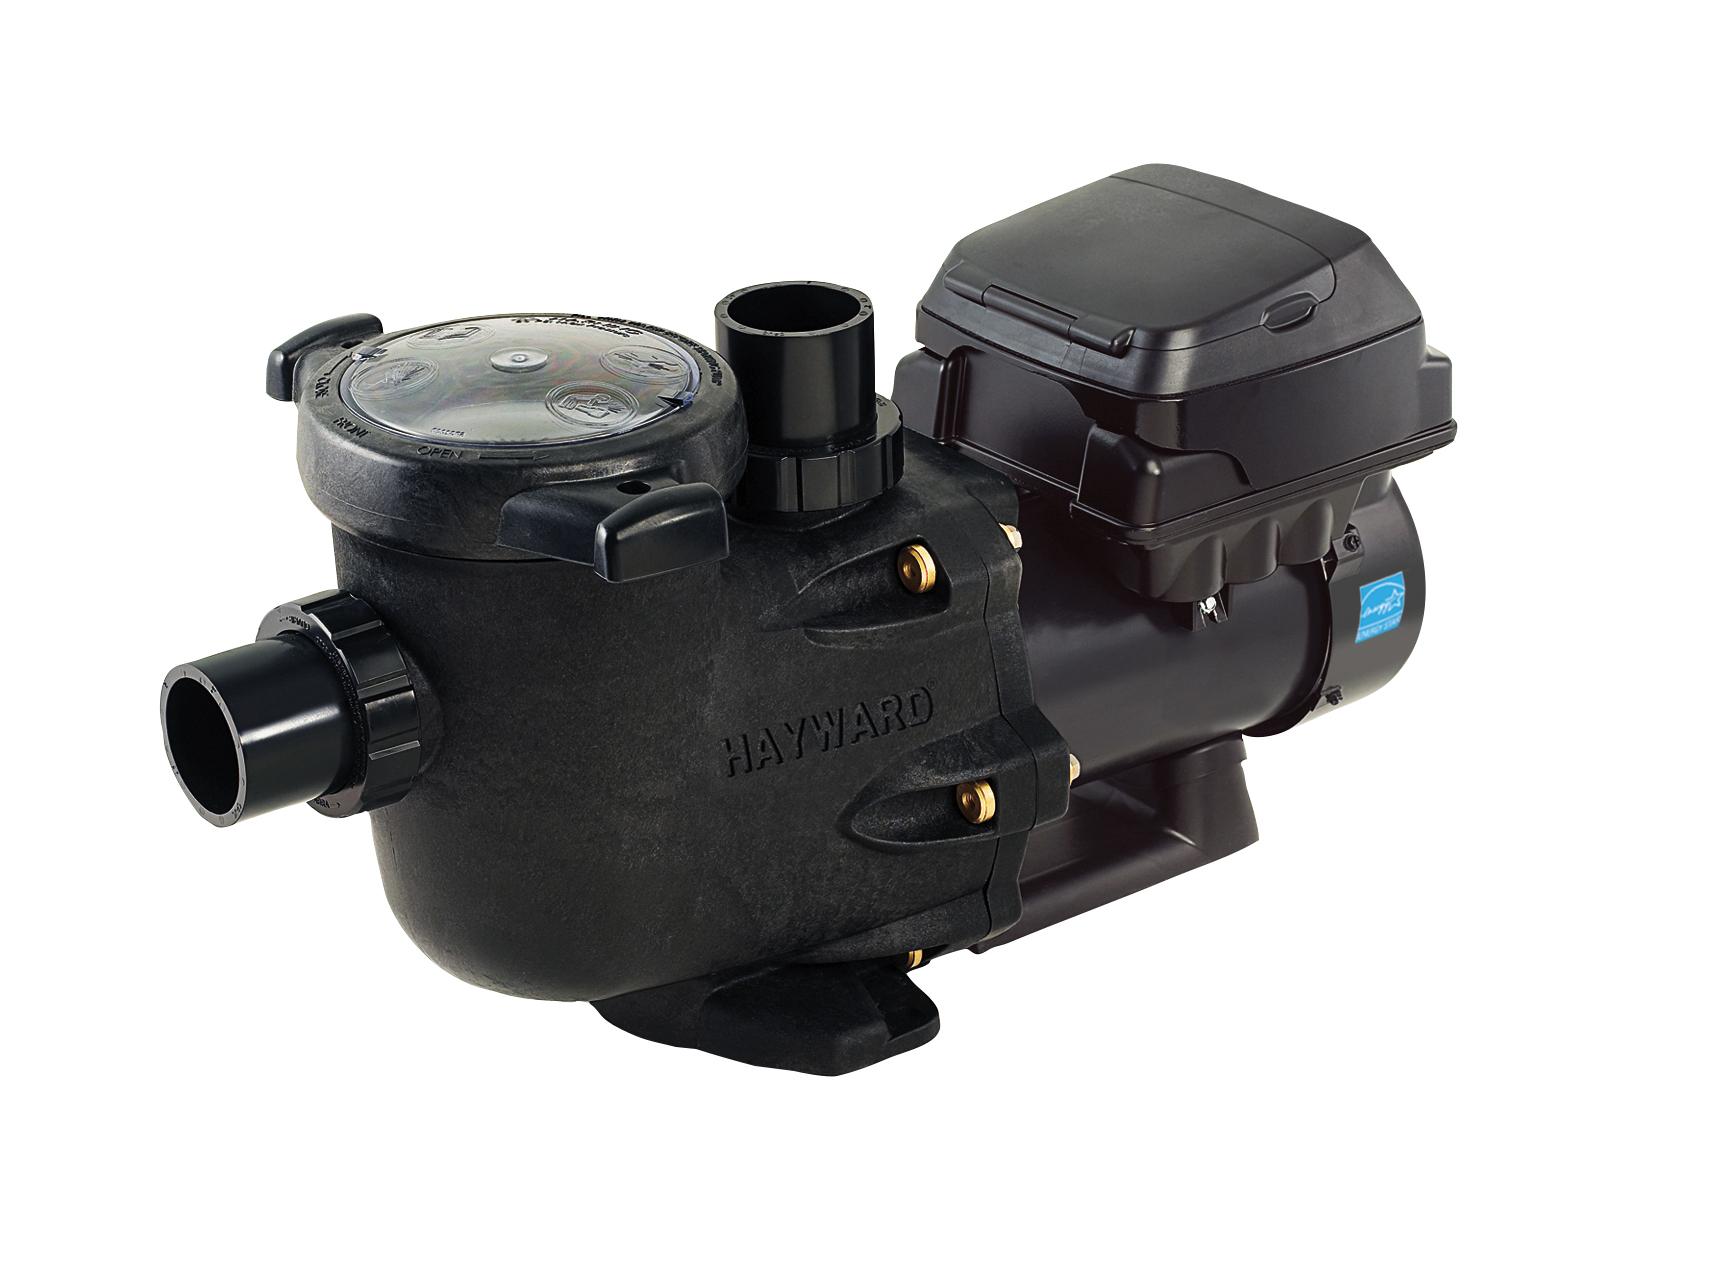 Hayward TristarVS Pool Pump Models Image